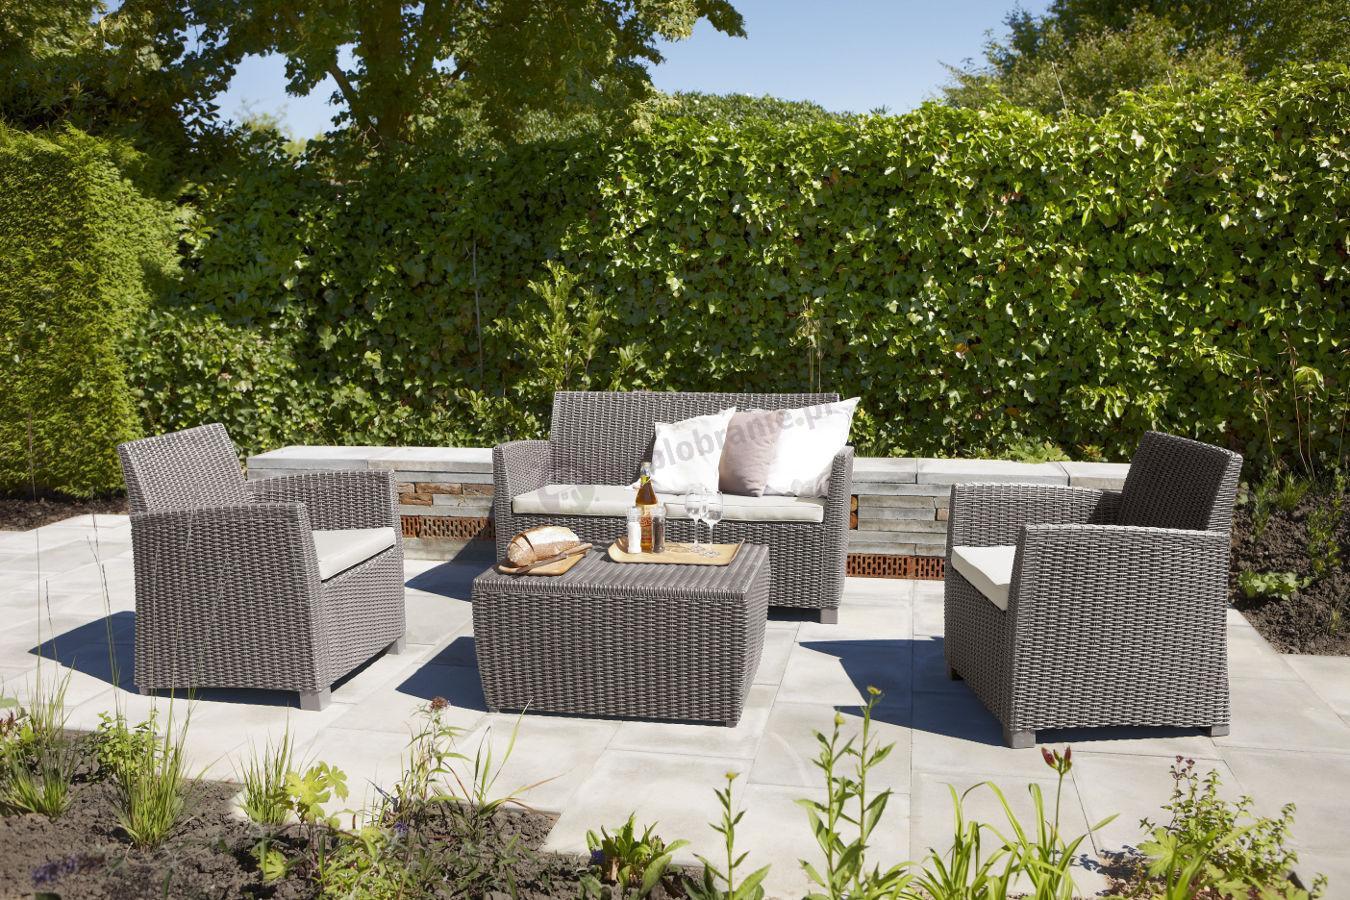 meble ogrodowe corona box producent curver allibert. Black Bedroom Furniture Sets. Home Design Ideas